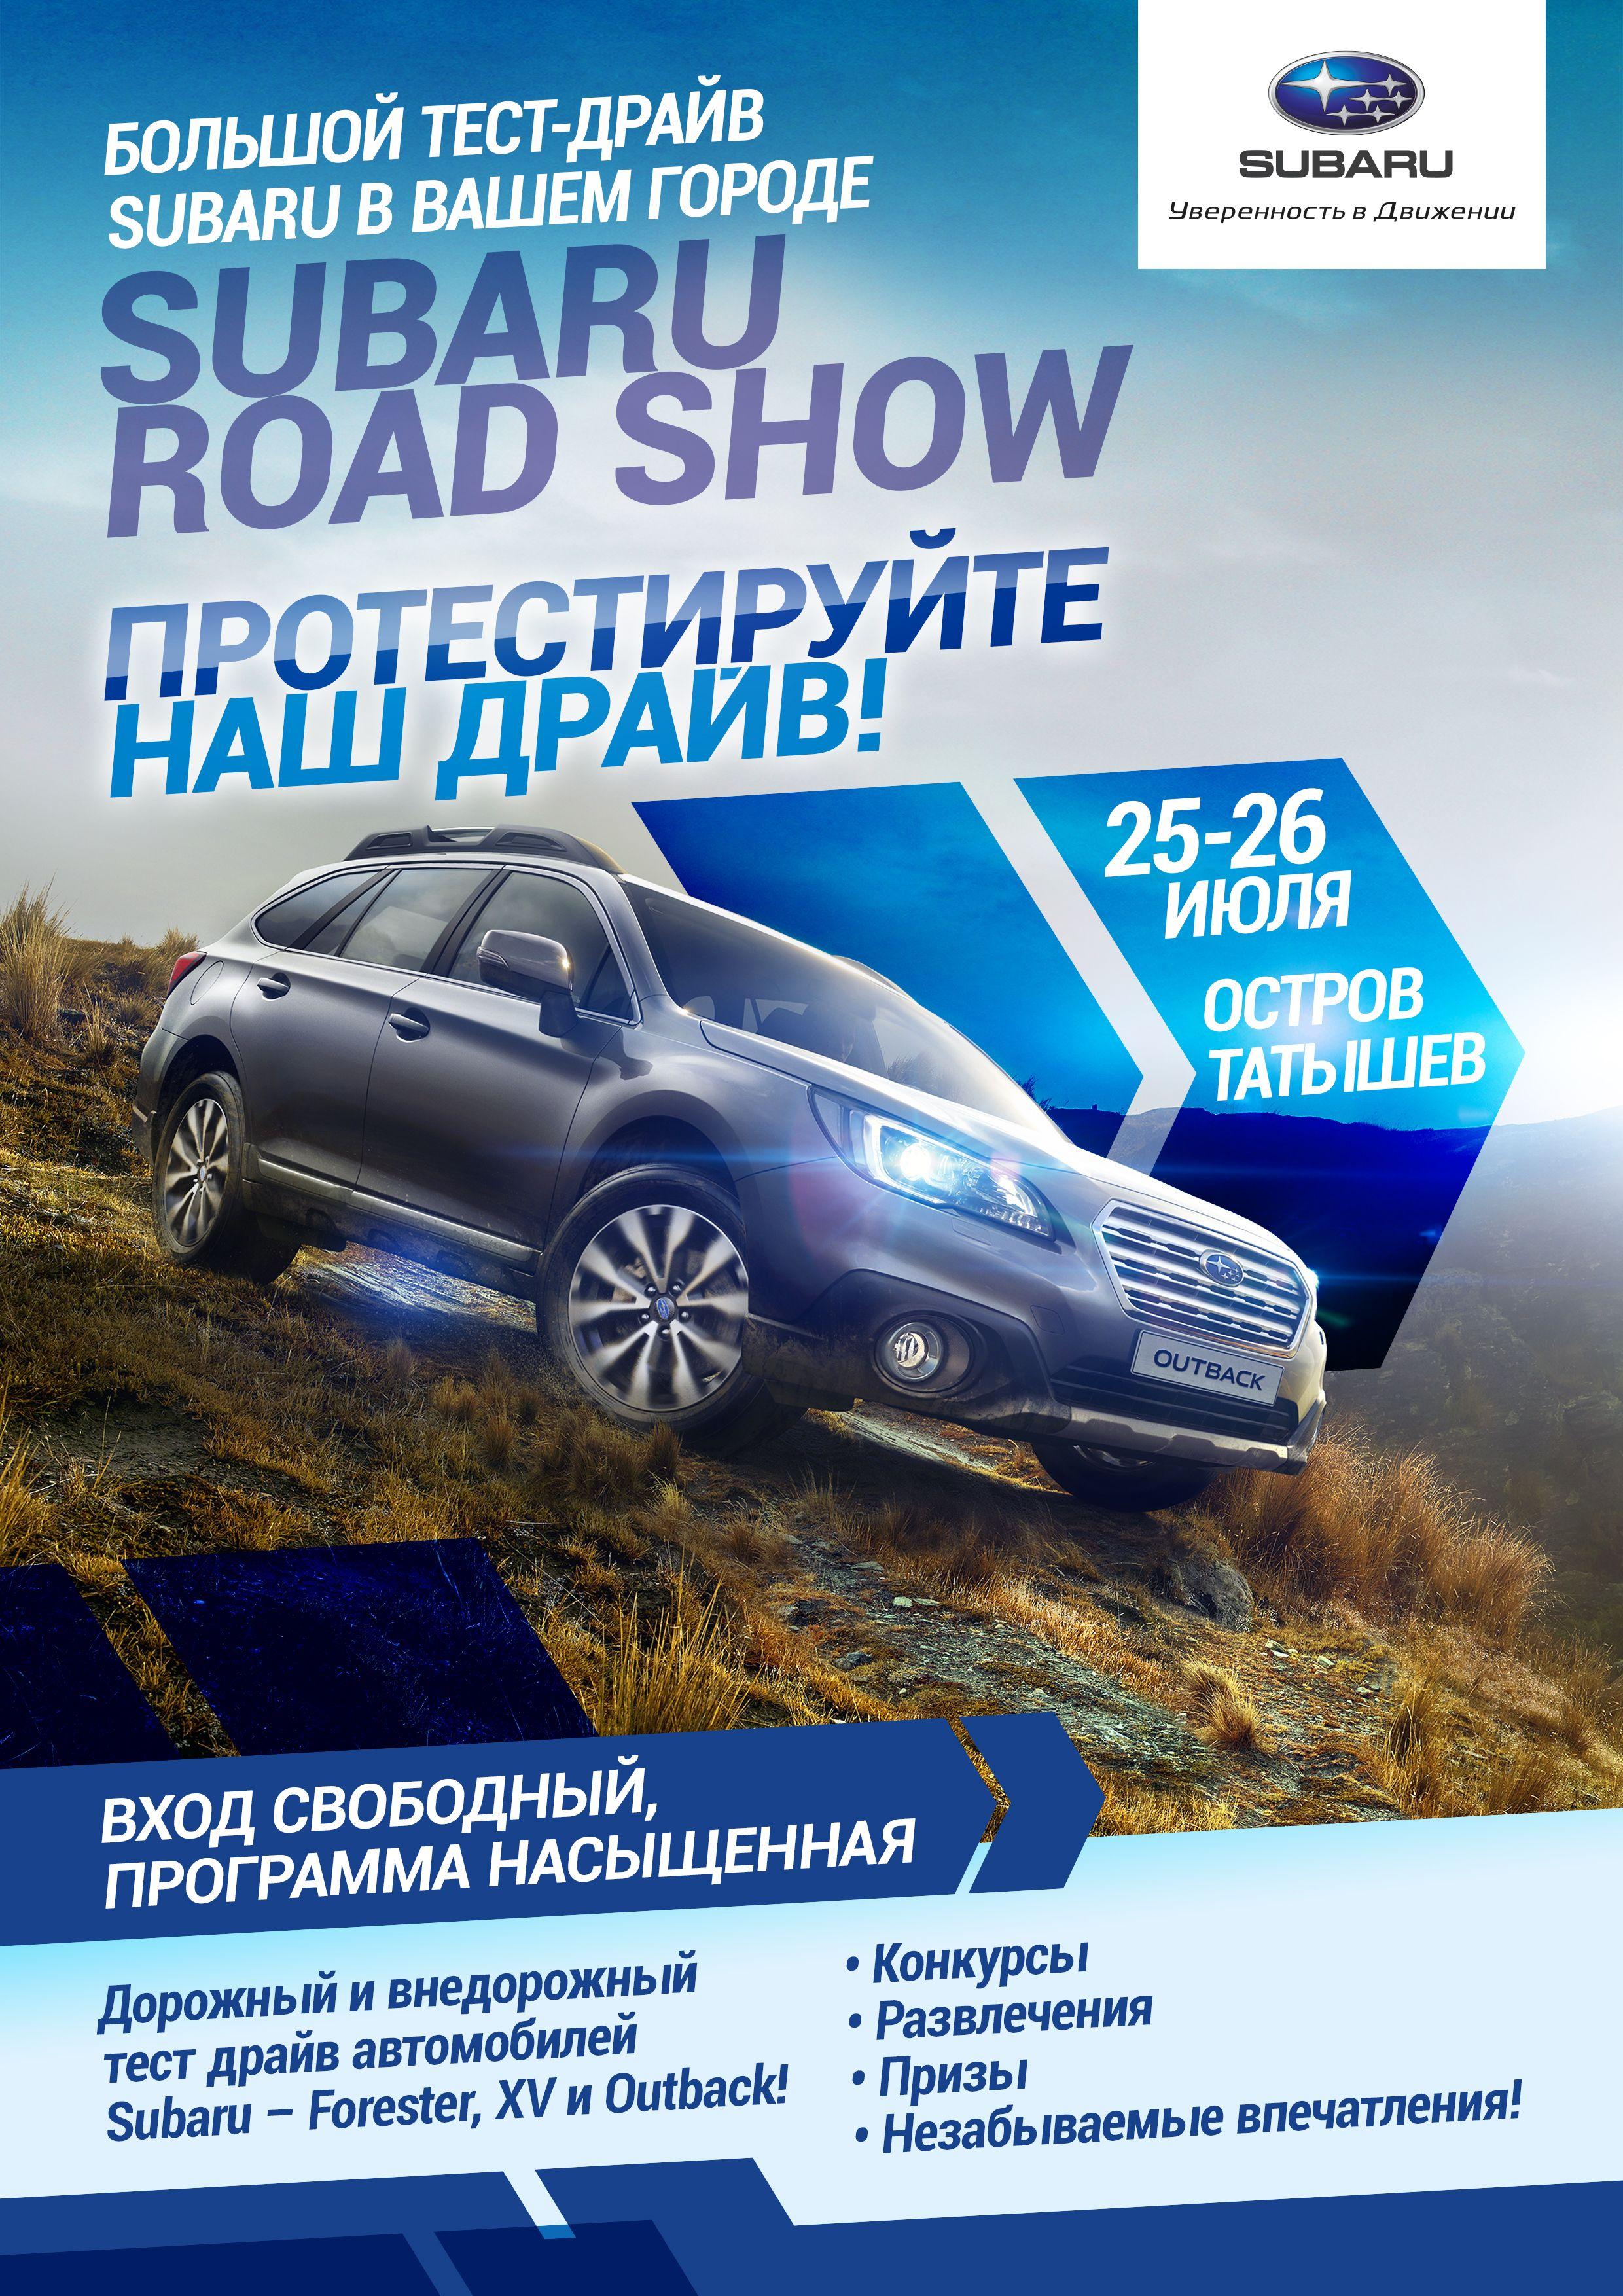 SUBARU ROAD SHOW  2015 в Красноярске!